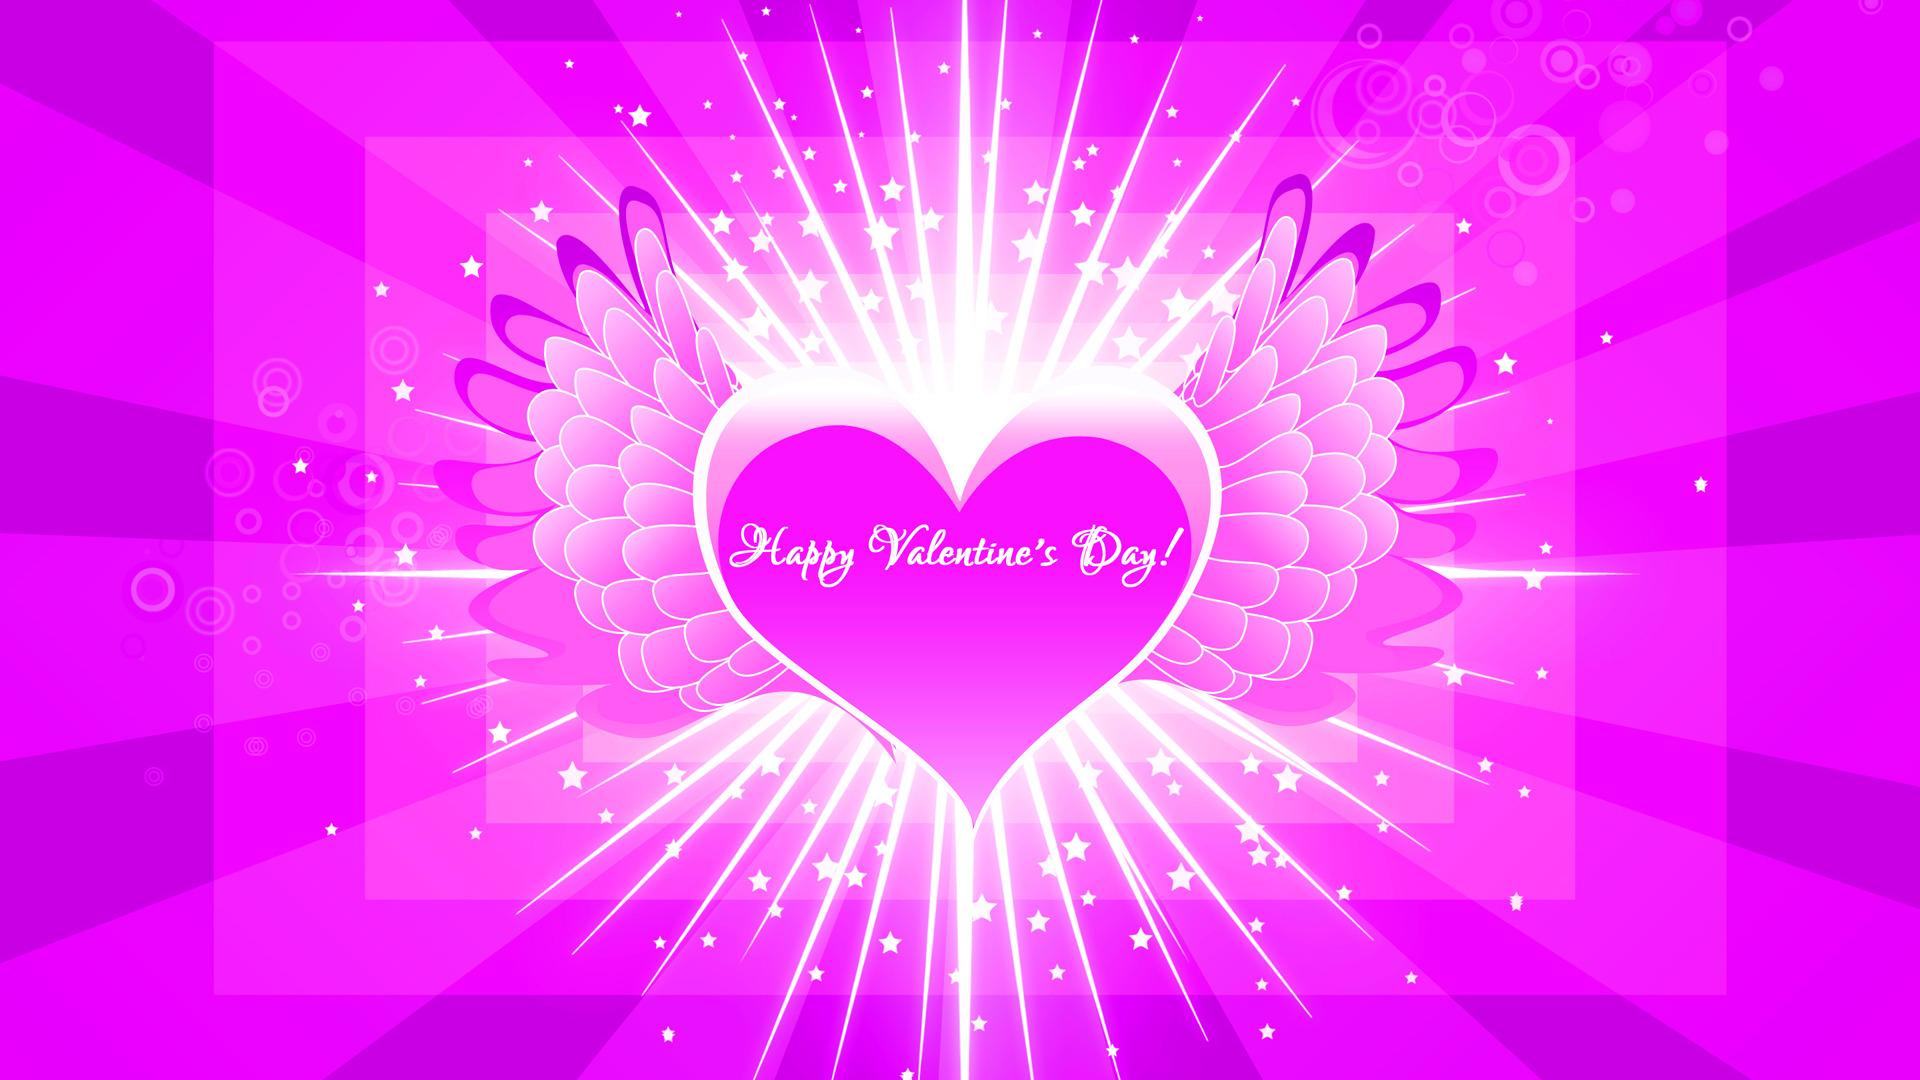 best hd valentine's day images for mobile   pc   desktop   laptop